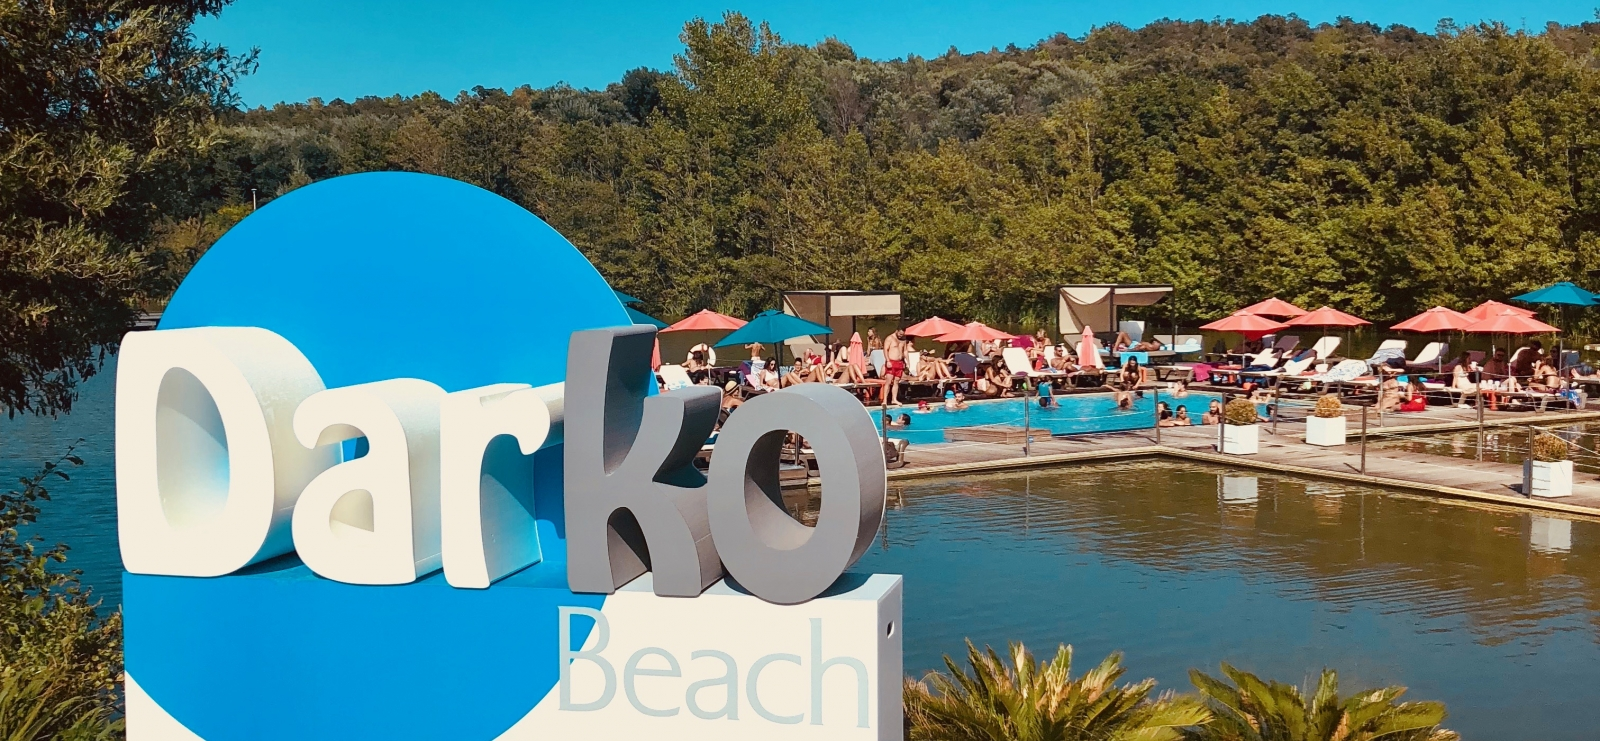 Darko Beach